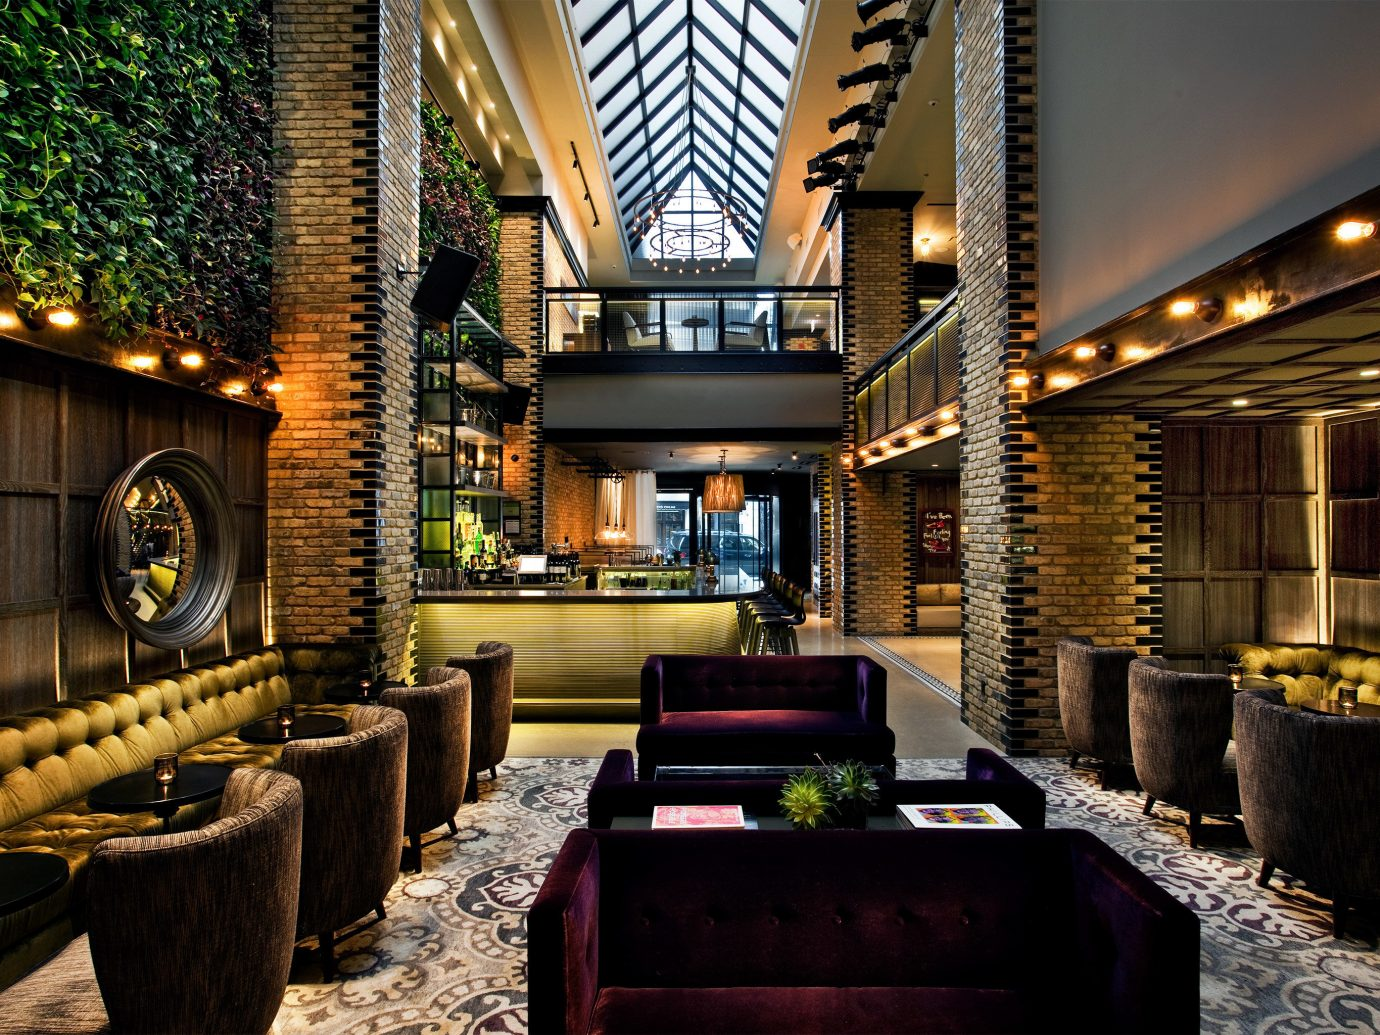 Hip Living Lounge Luxury Modern Trip Ideas estate Lobby restaurant interior design Resort Bar mansion furniture stone